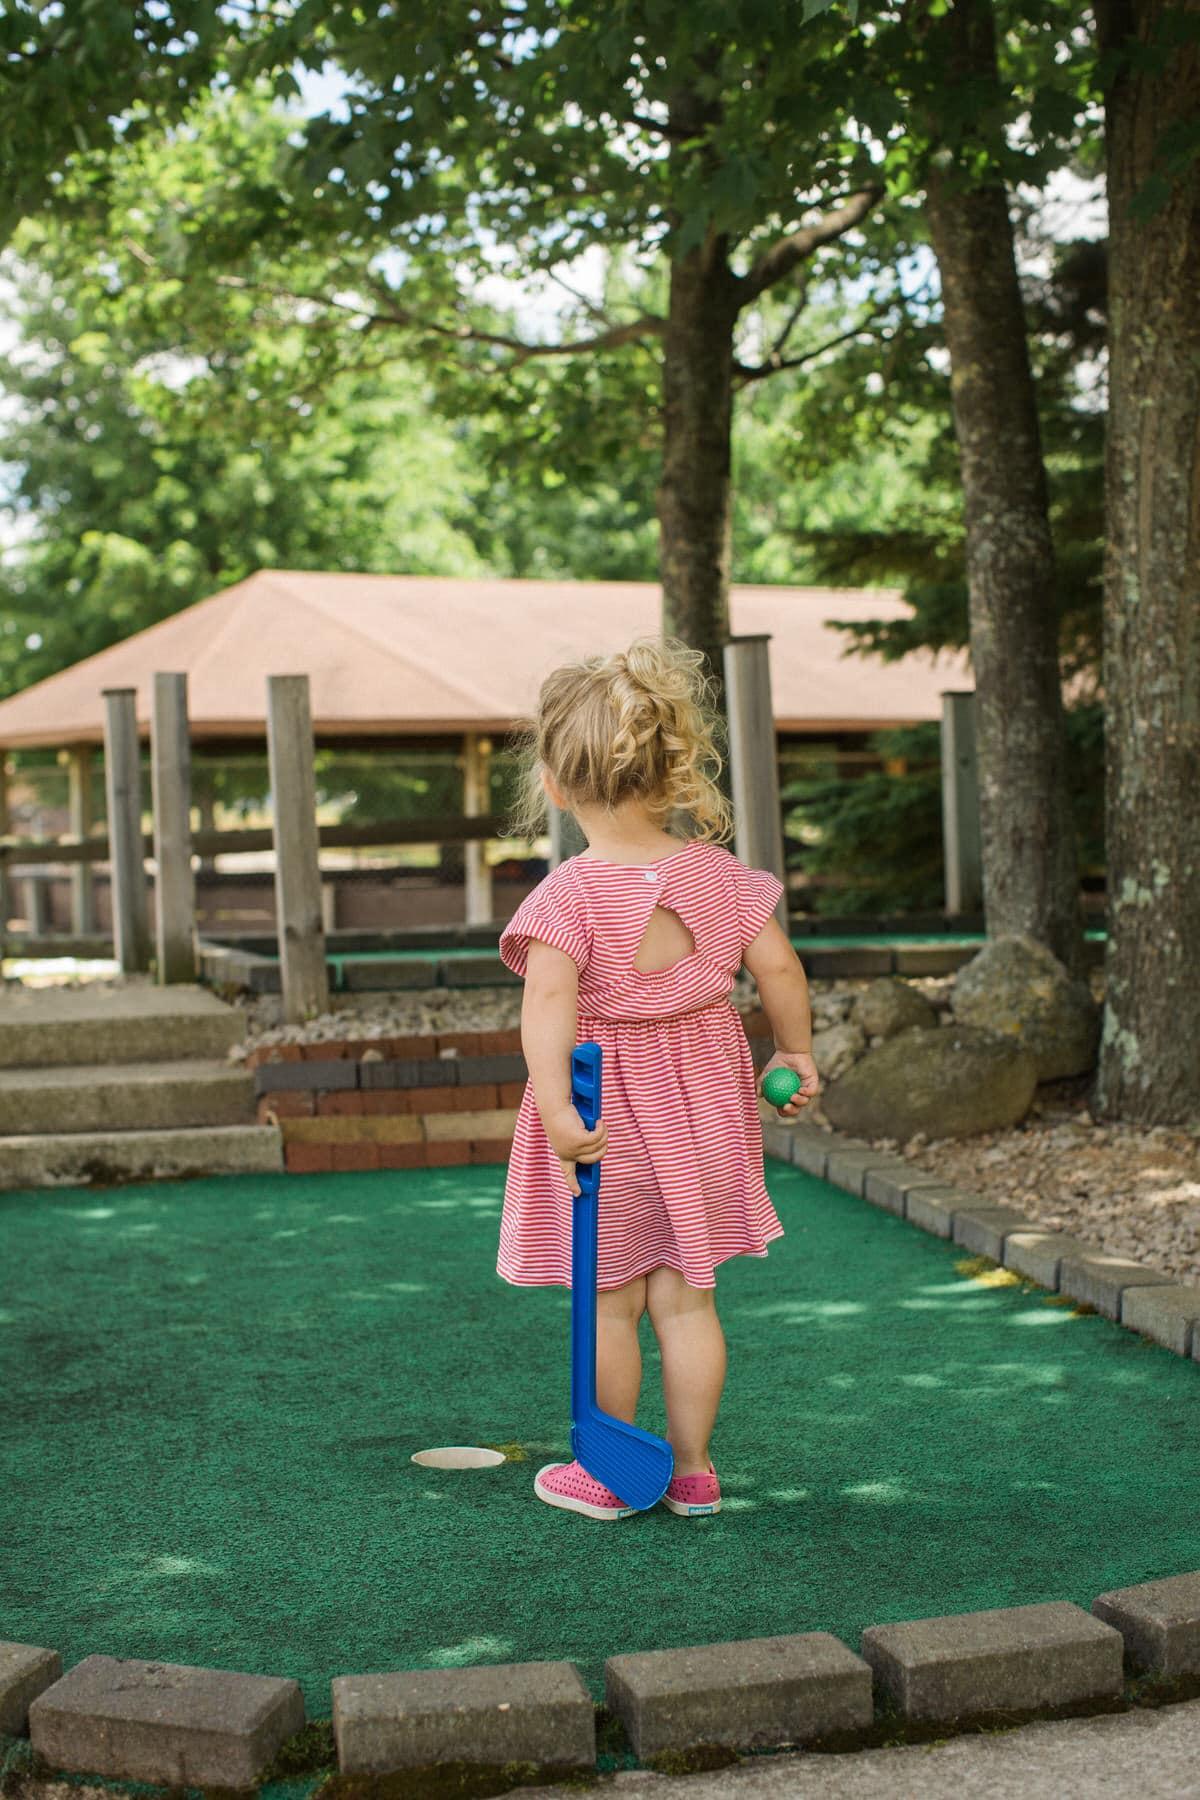 mini-golf-Crivitz-Wisconsin-fine-art-photography-by-Studio-L-photographer-Laura-Schneider-_9646